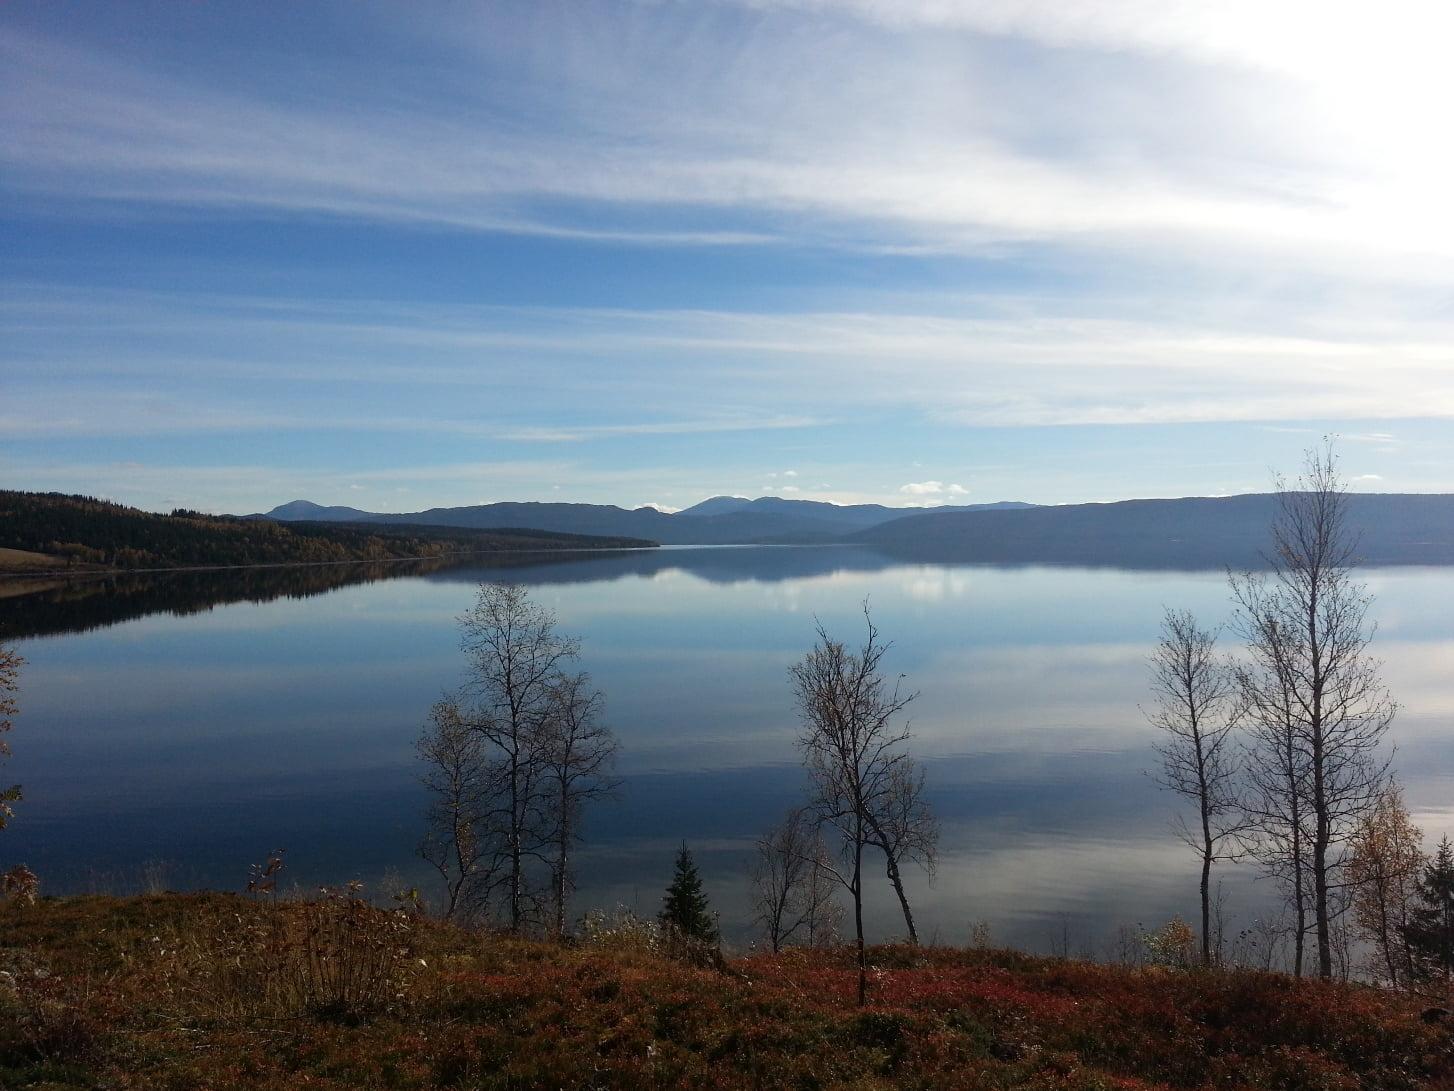 Vy över Stora Blåsjön Höst